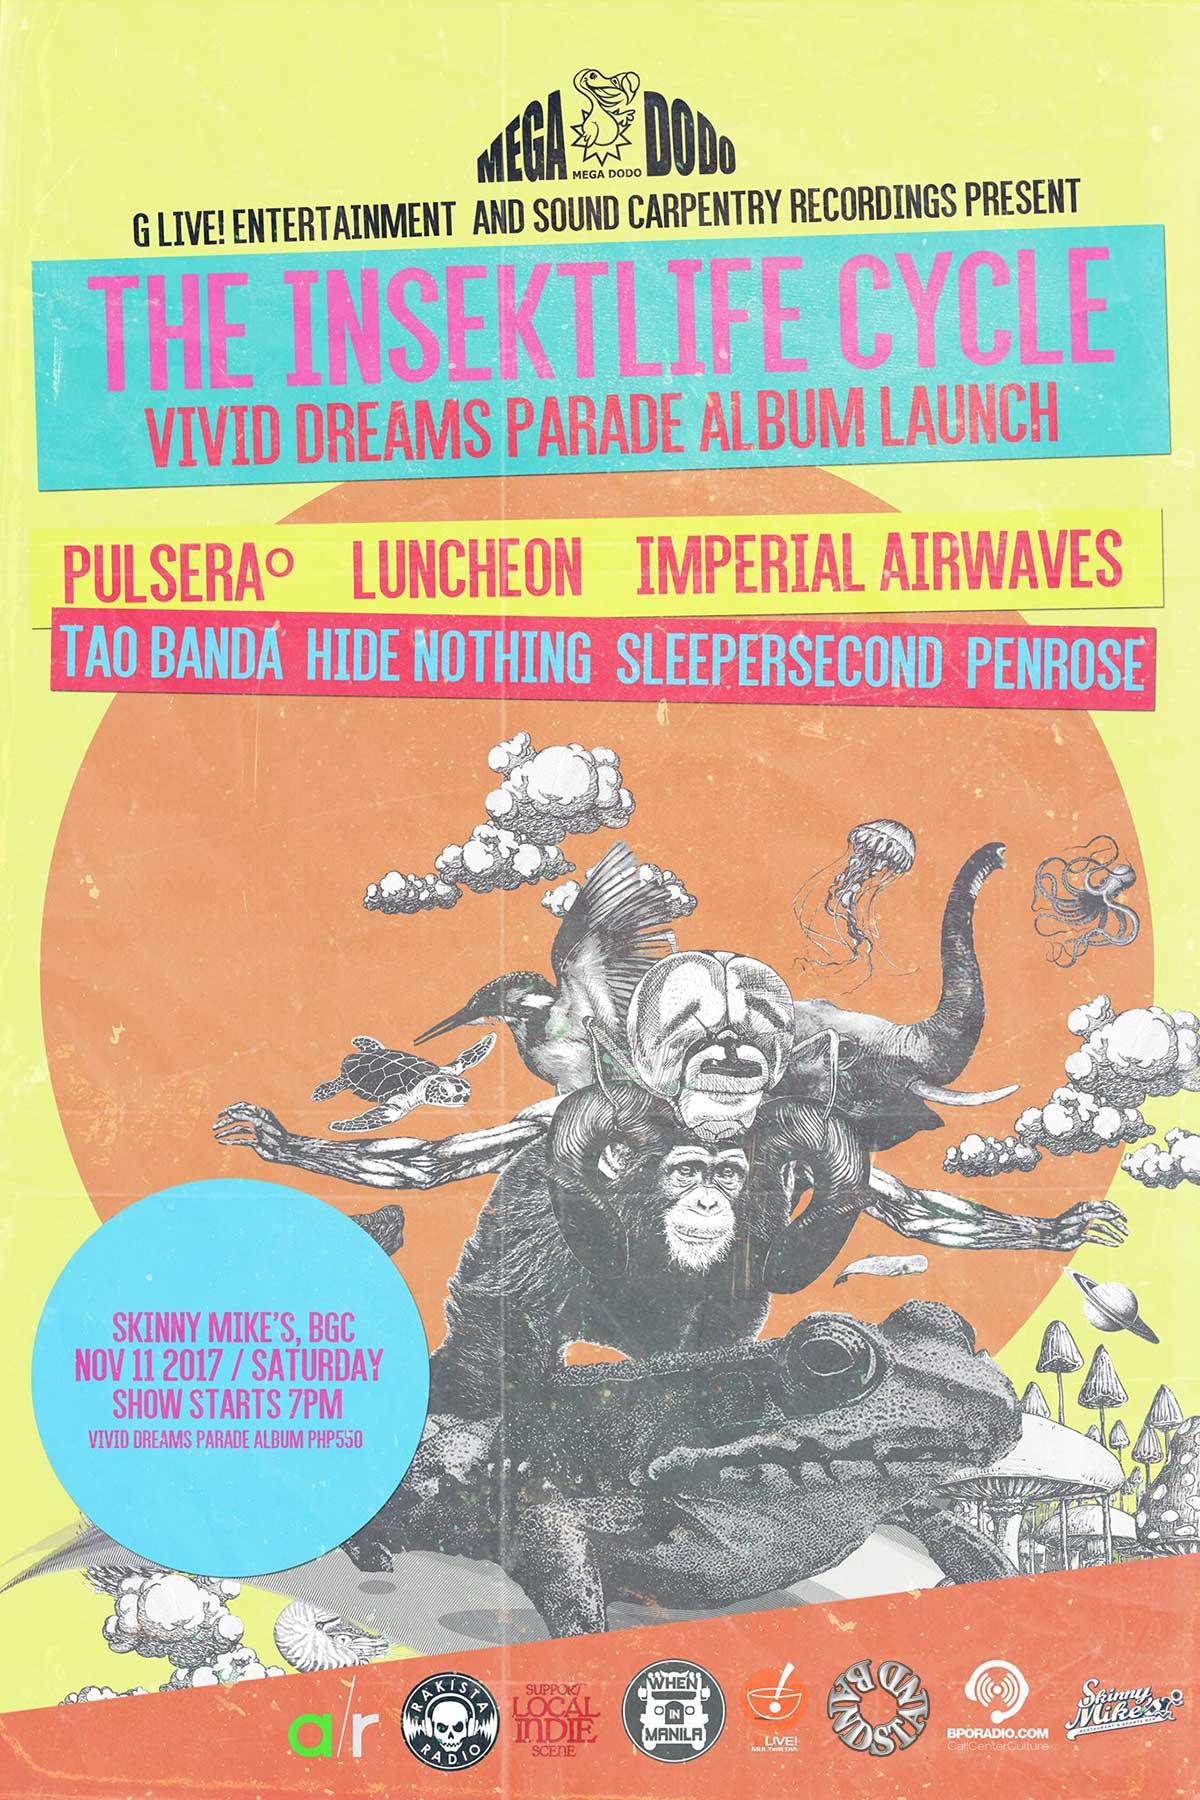 G Live! Entertainment - The Insektlife Cycle Vivid Dreams Parade